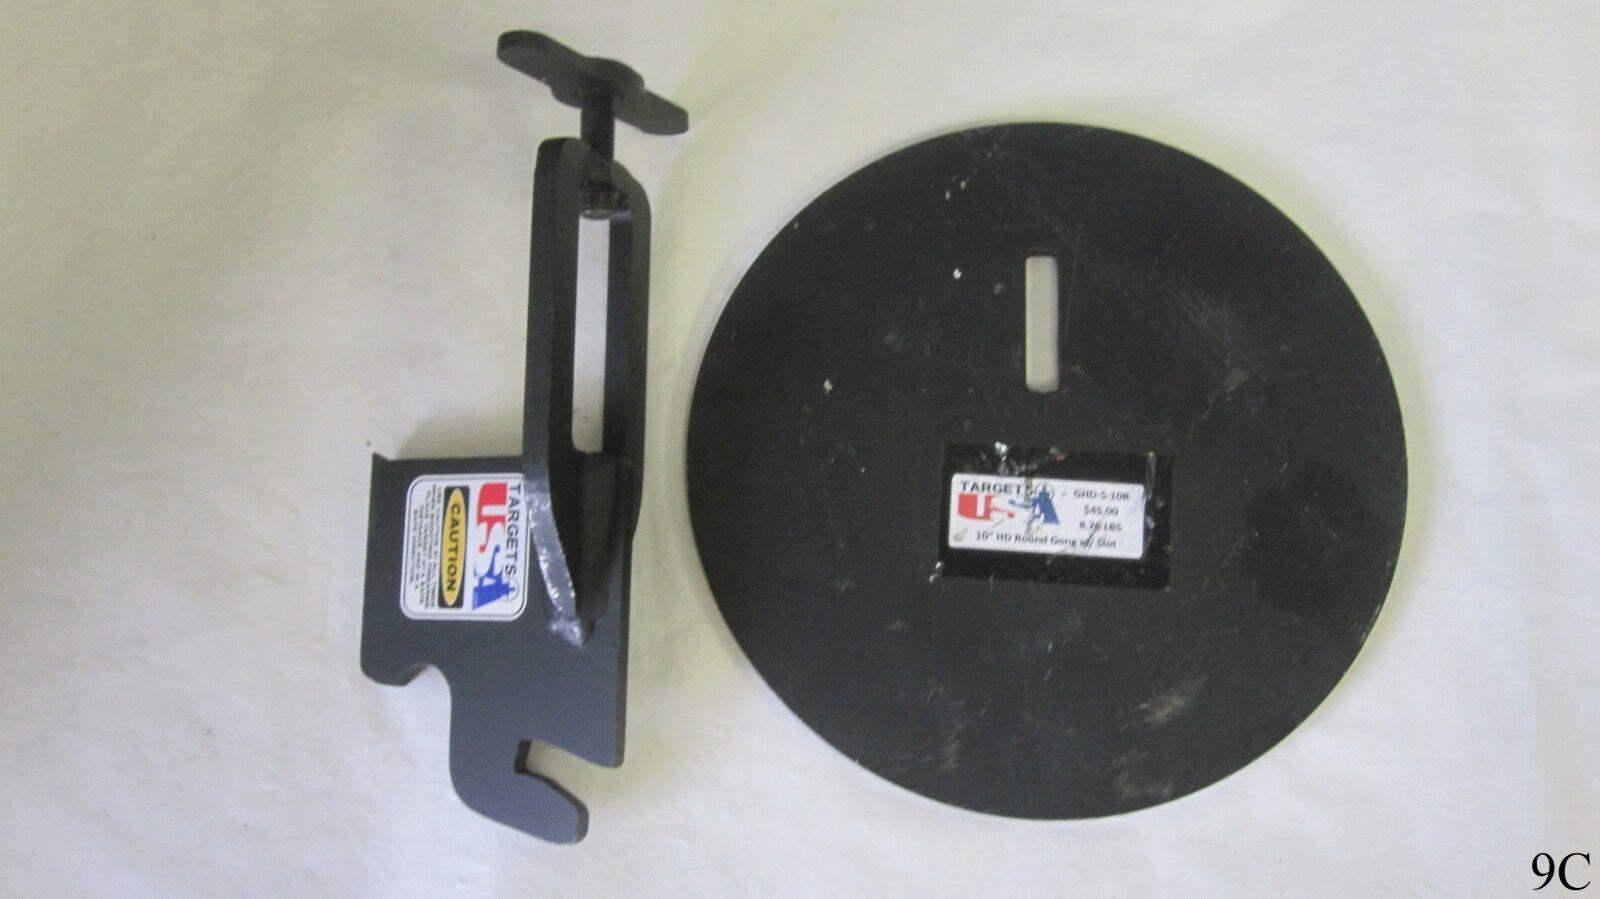 10 pulgadas 8.26 lb Gong objetivo con colgador de 2x4